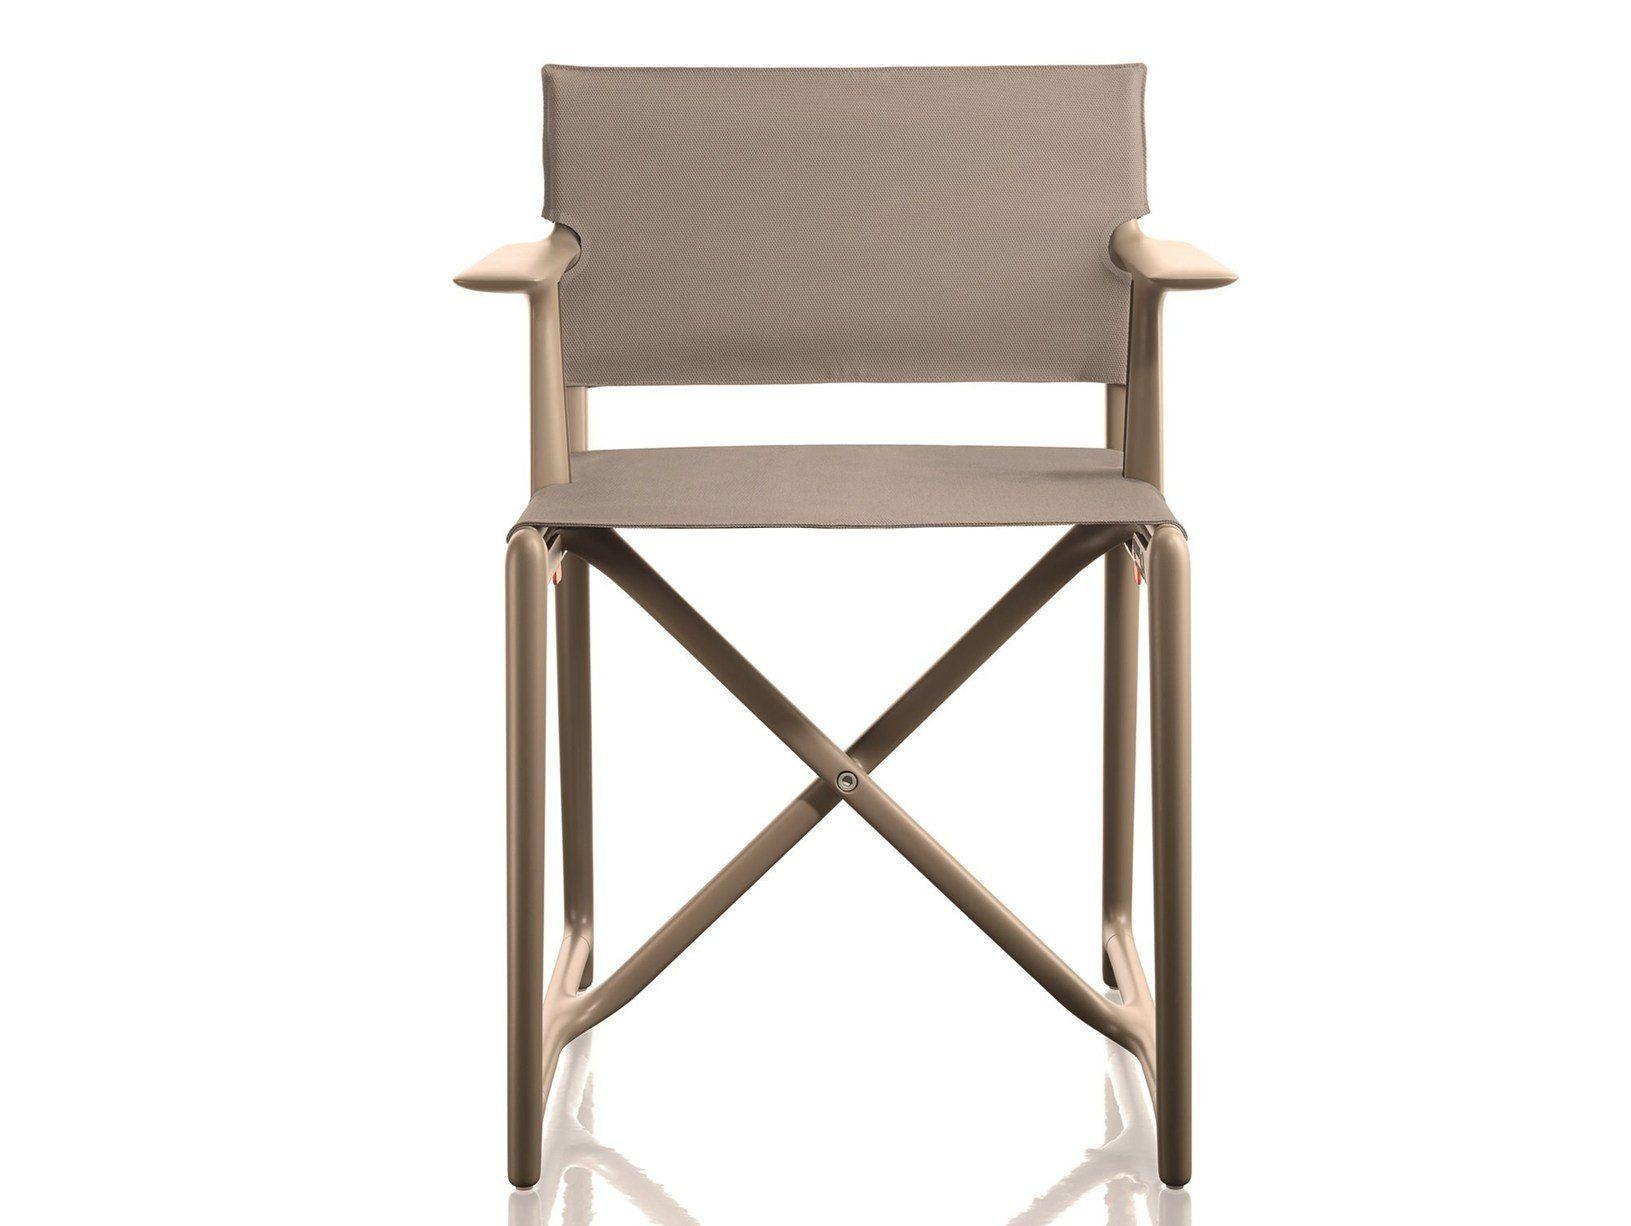 Starck reinterprets the director\'s chair